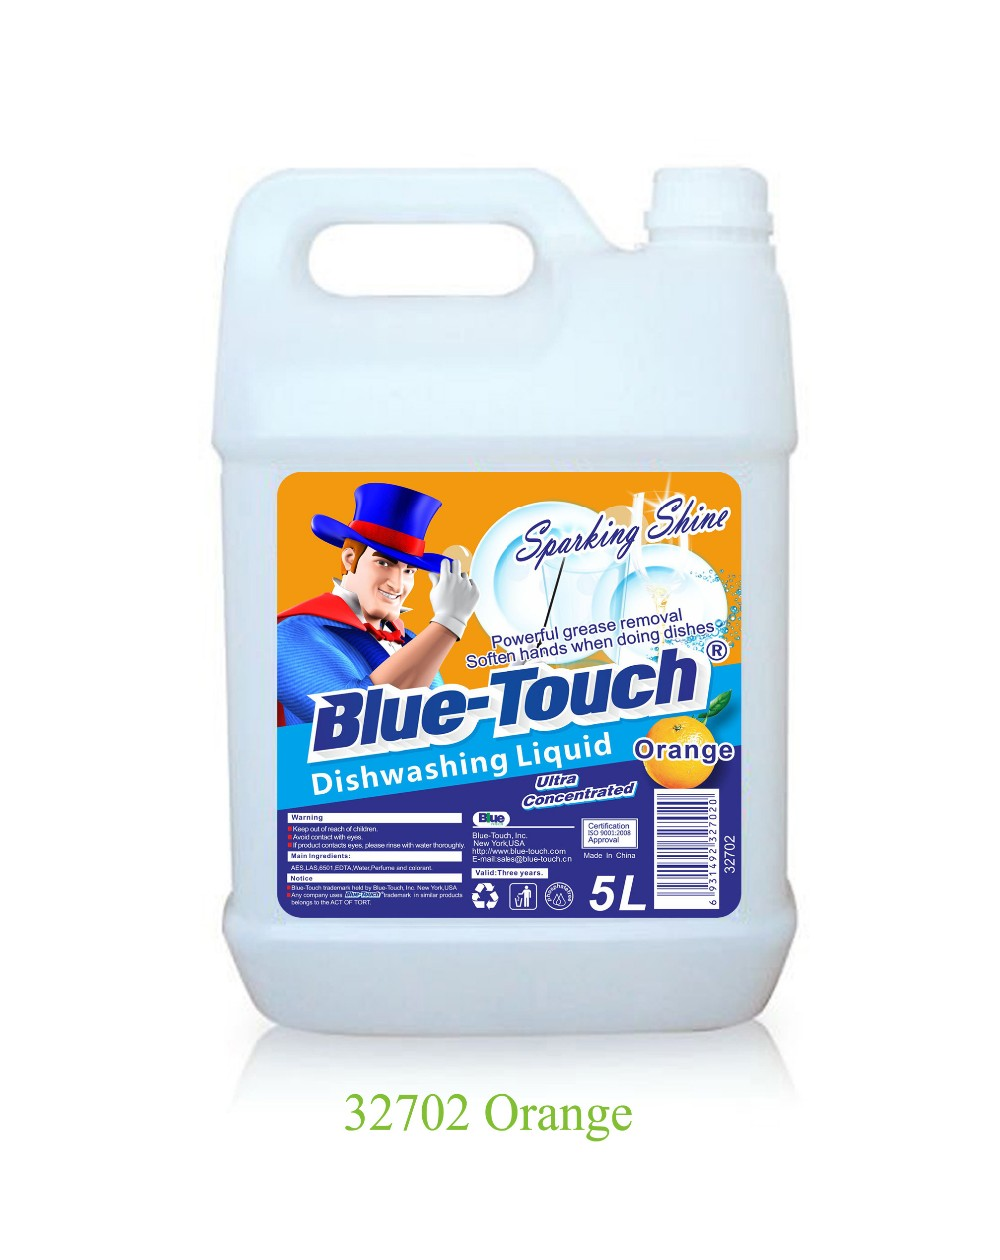 Bulk Dishwashing Detergent 5l Dishwashing Liquid Wholesale - Buy  Dishwashing Detergent,Bulk Dishwashing Detergent Product on Alibaba com